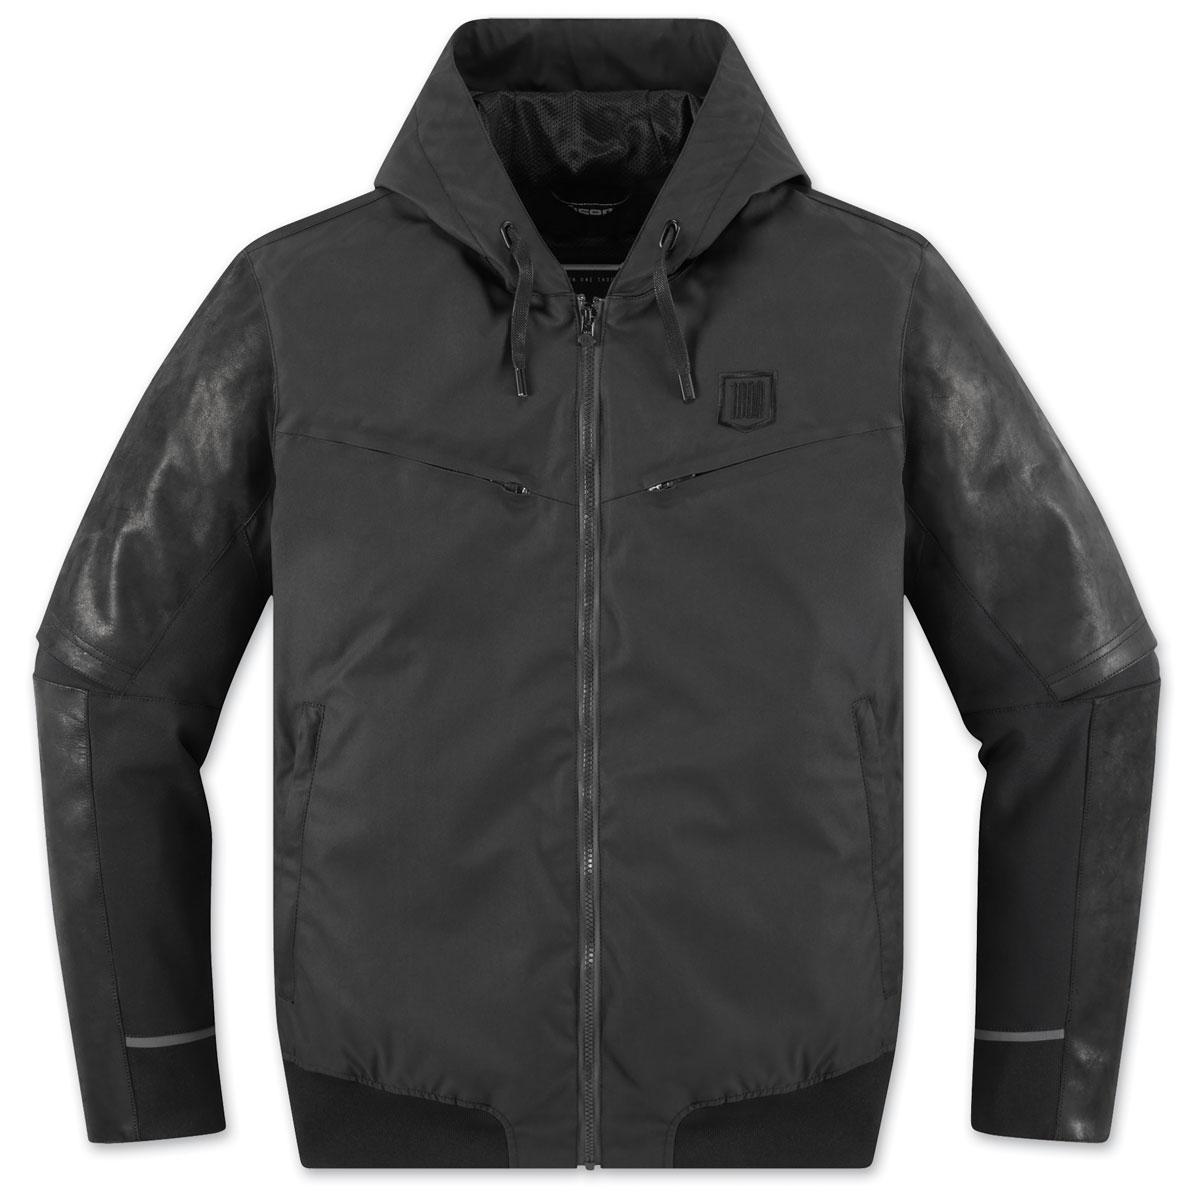 ICON One Thousand Men's Varial Black Jacket